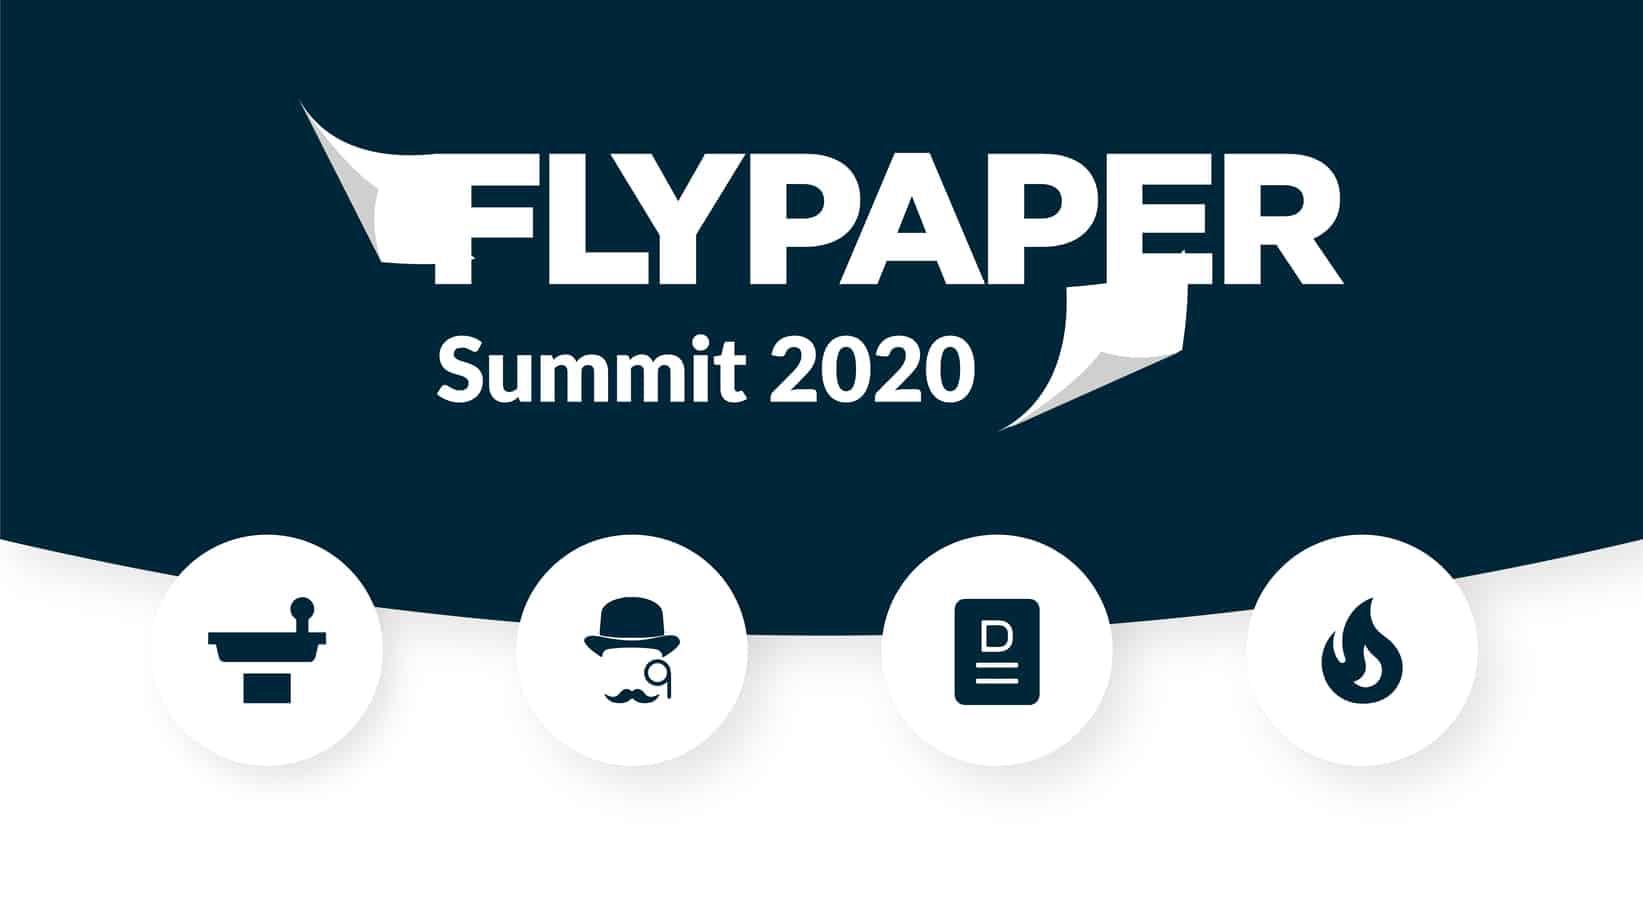 FlyPaper Summit 2020 Recap